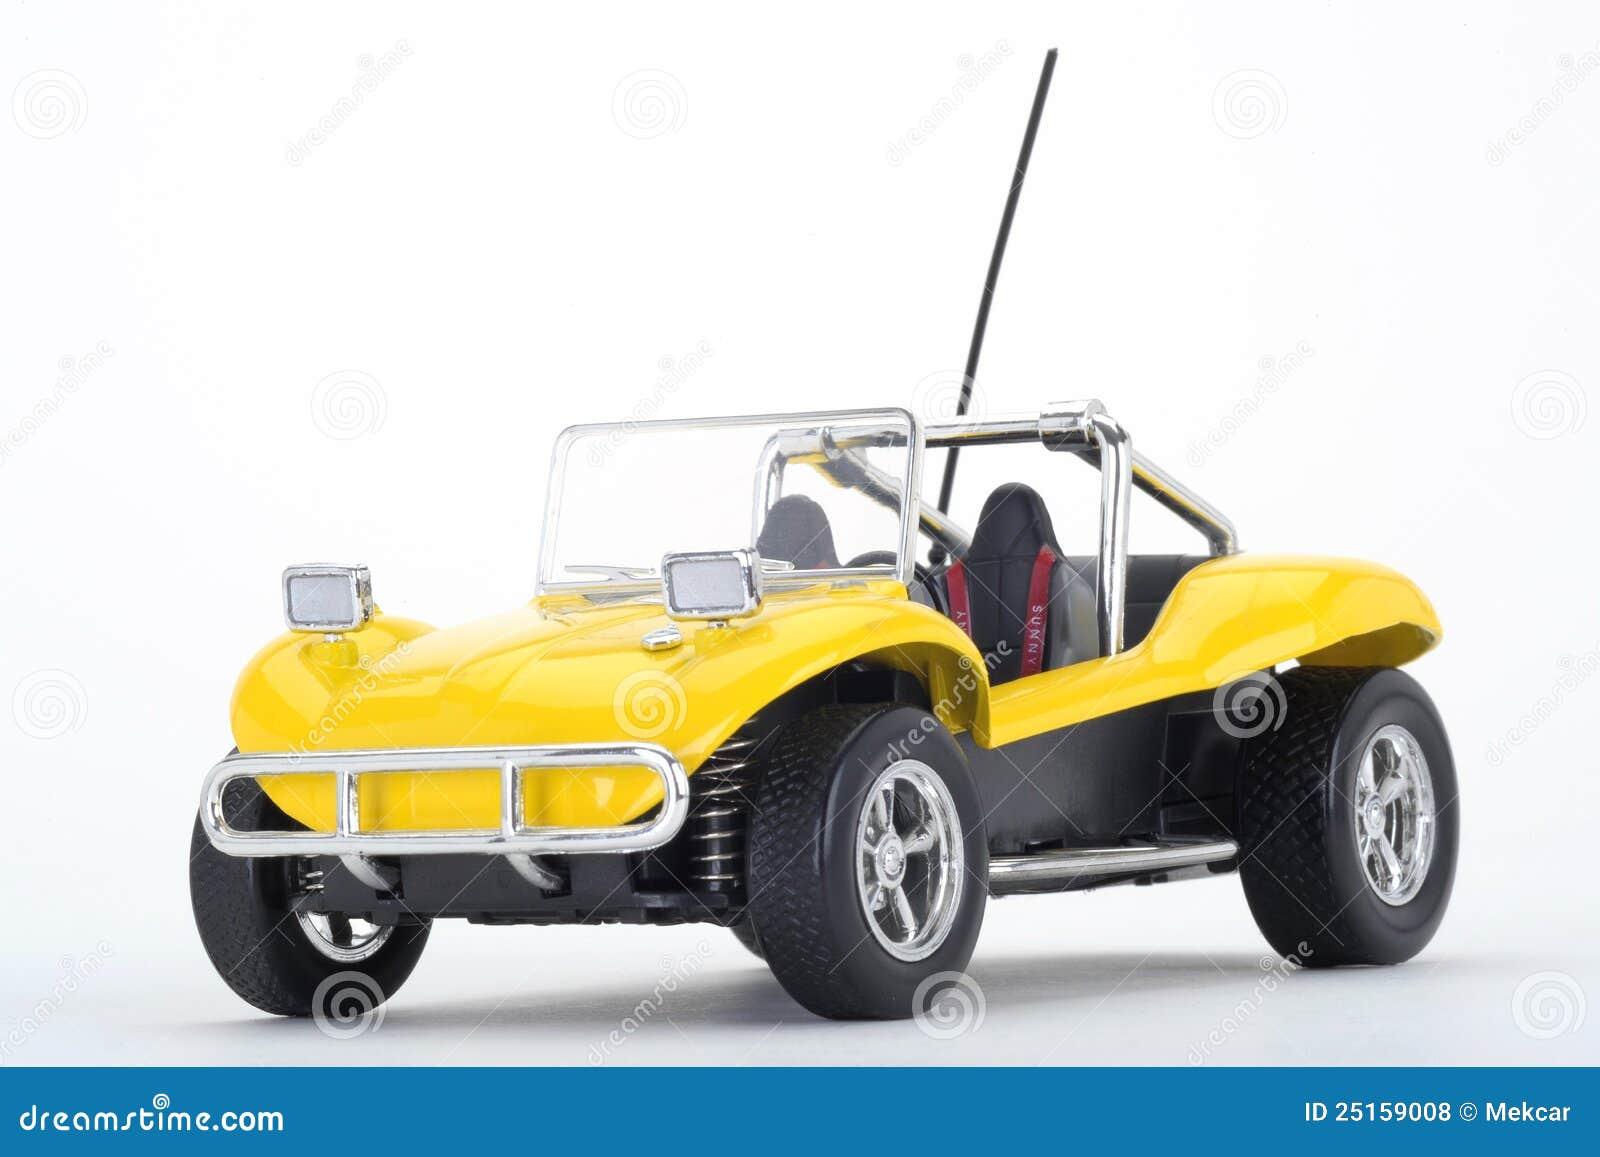 Buggy de duna amarelo